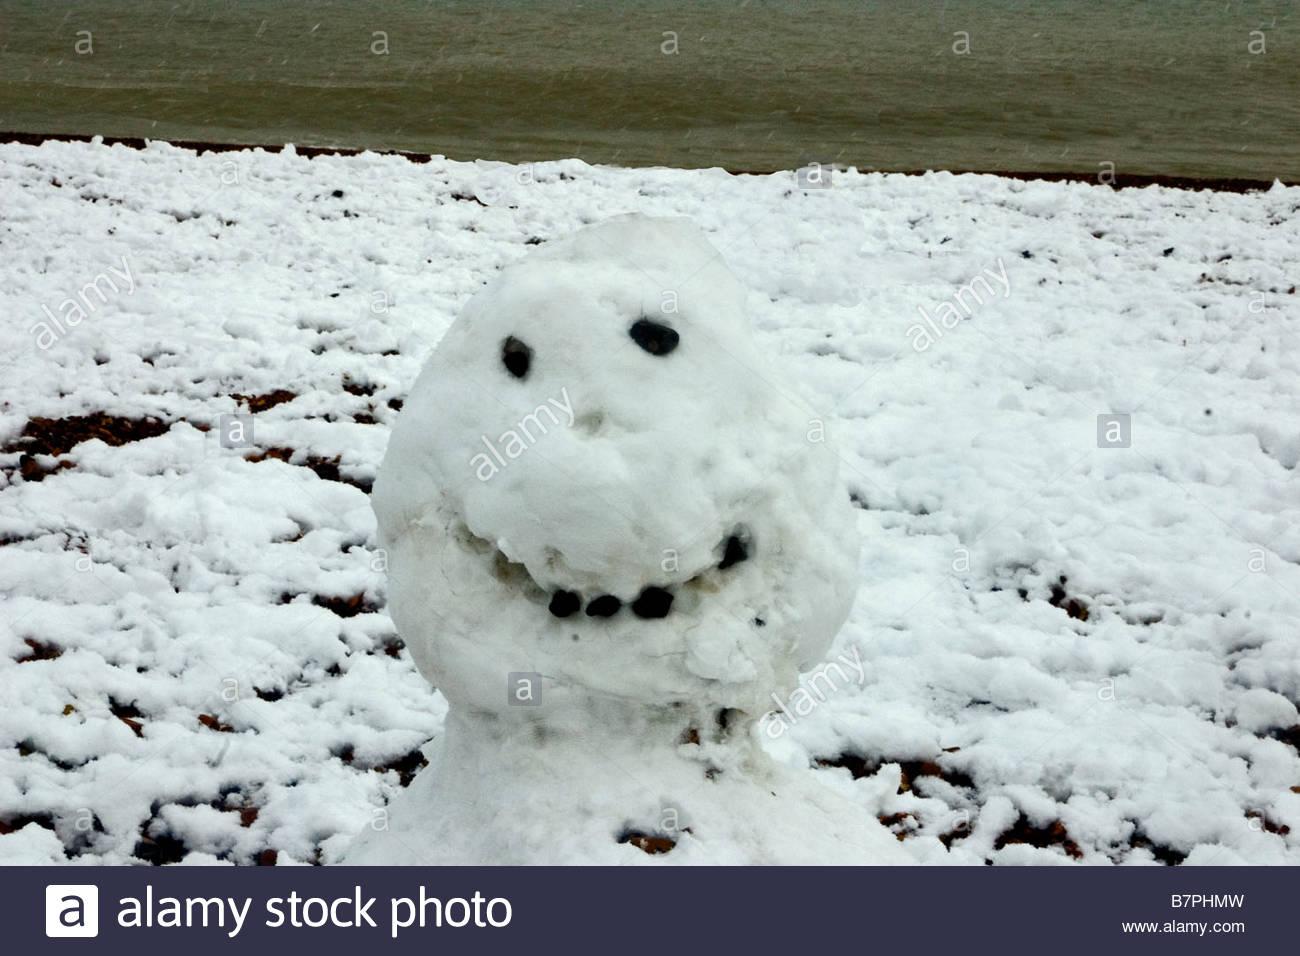 Snowman face on Brighton beach - Stock Image